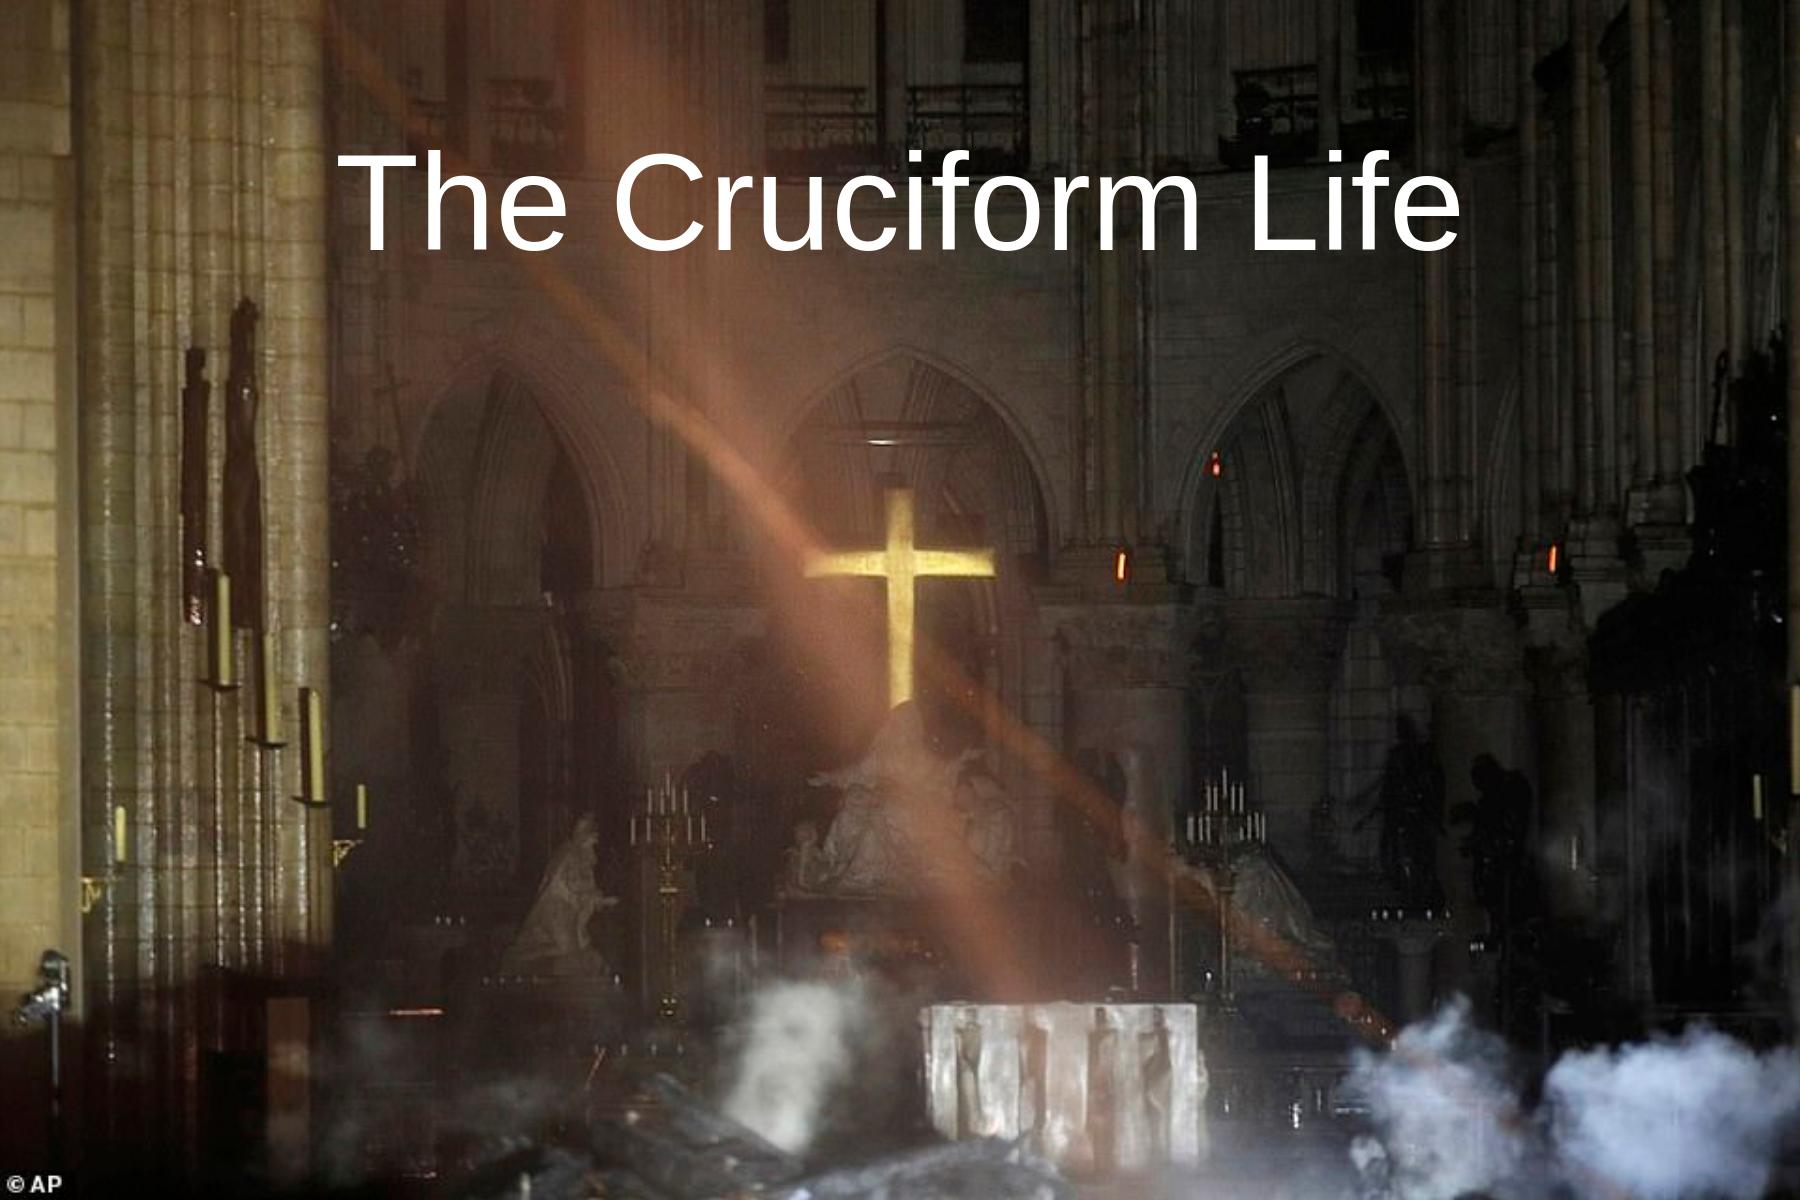 The Cruciform Life